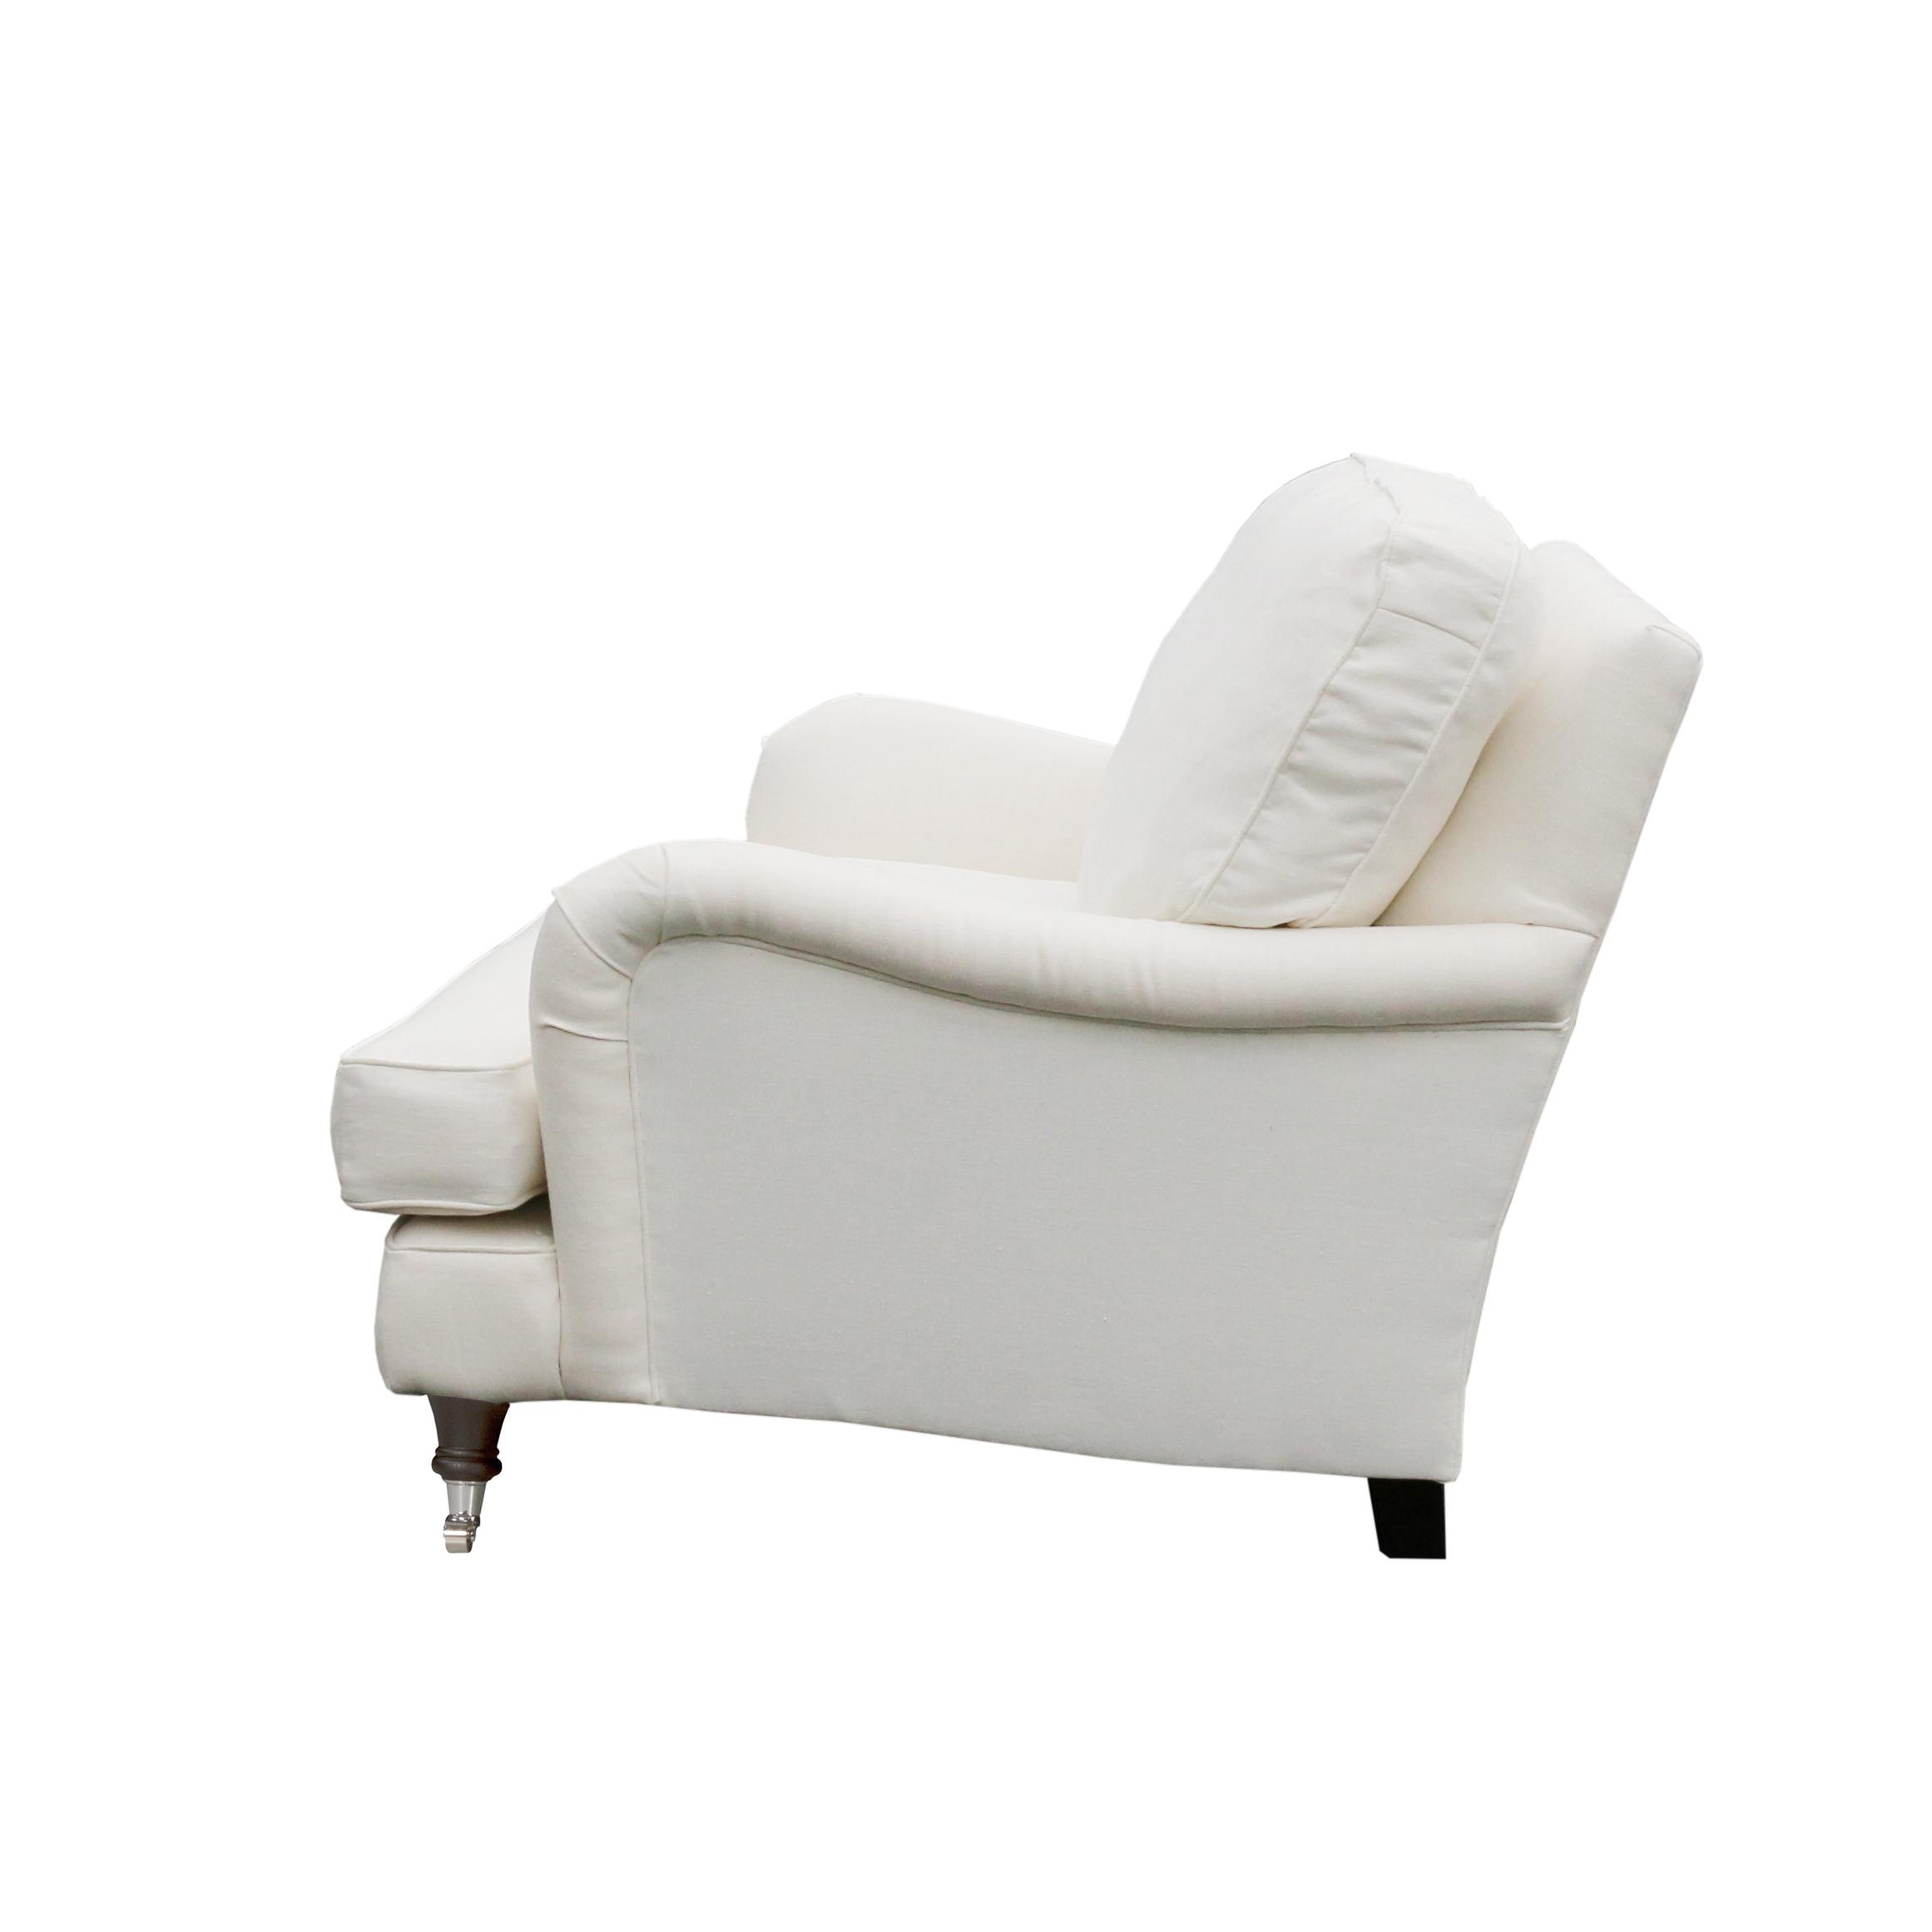 Howard Love Seat 2-sits från sidan - englesson.se